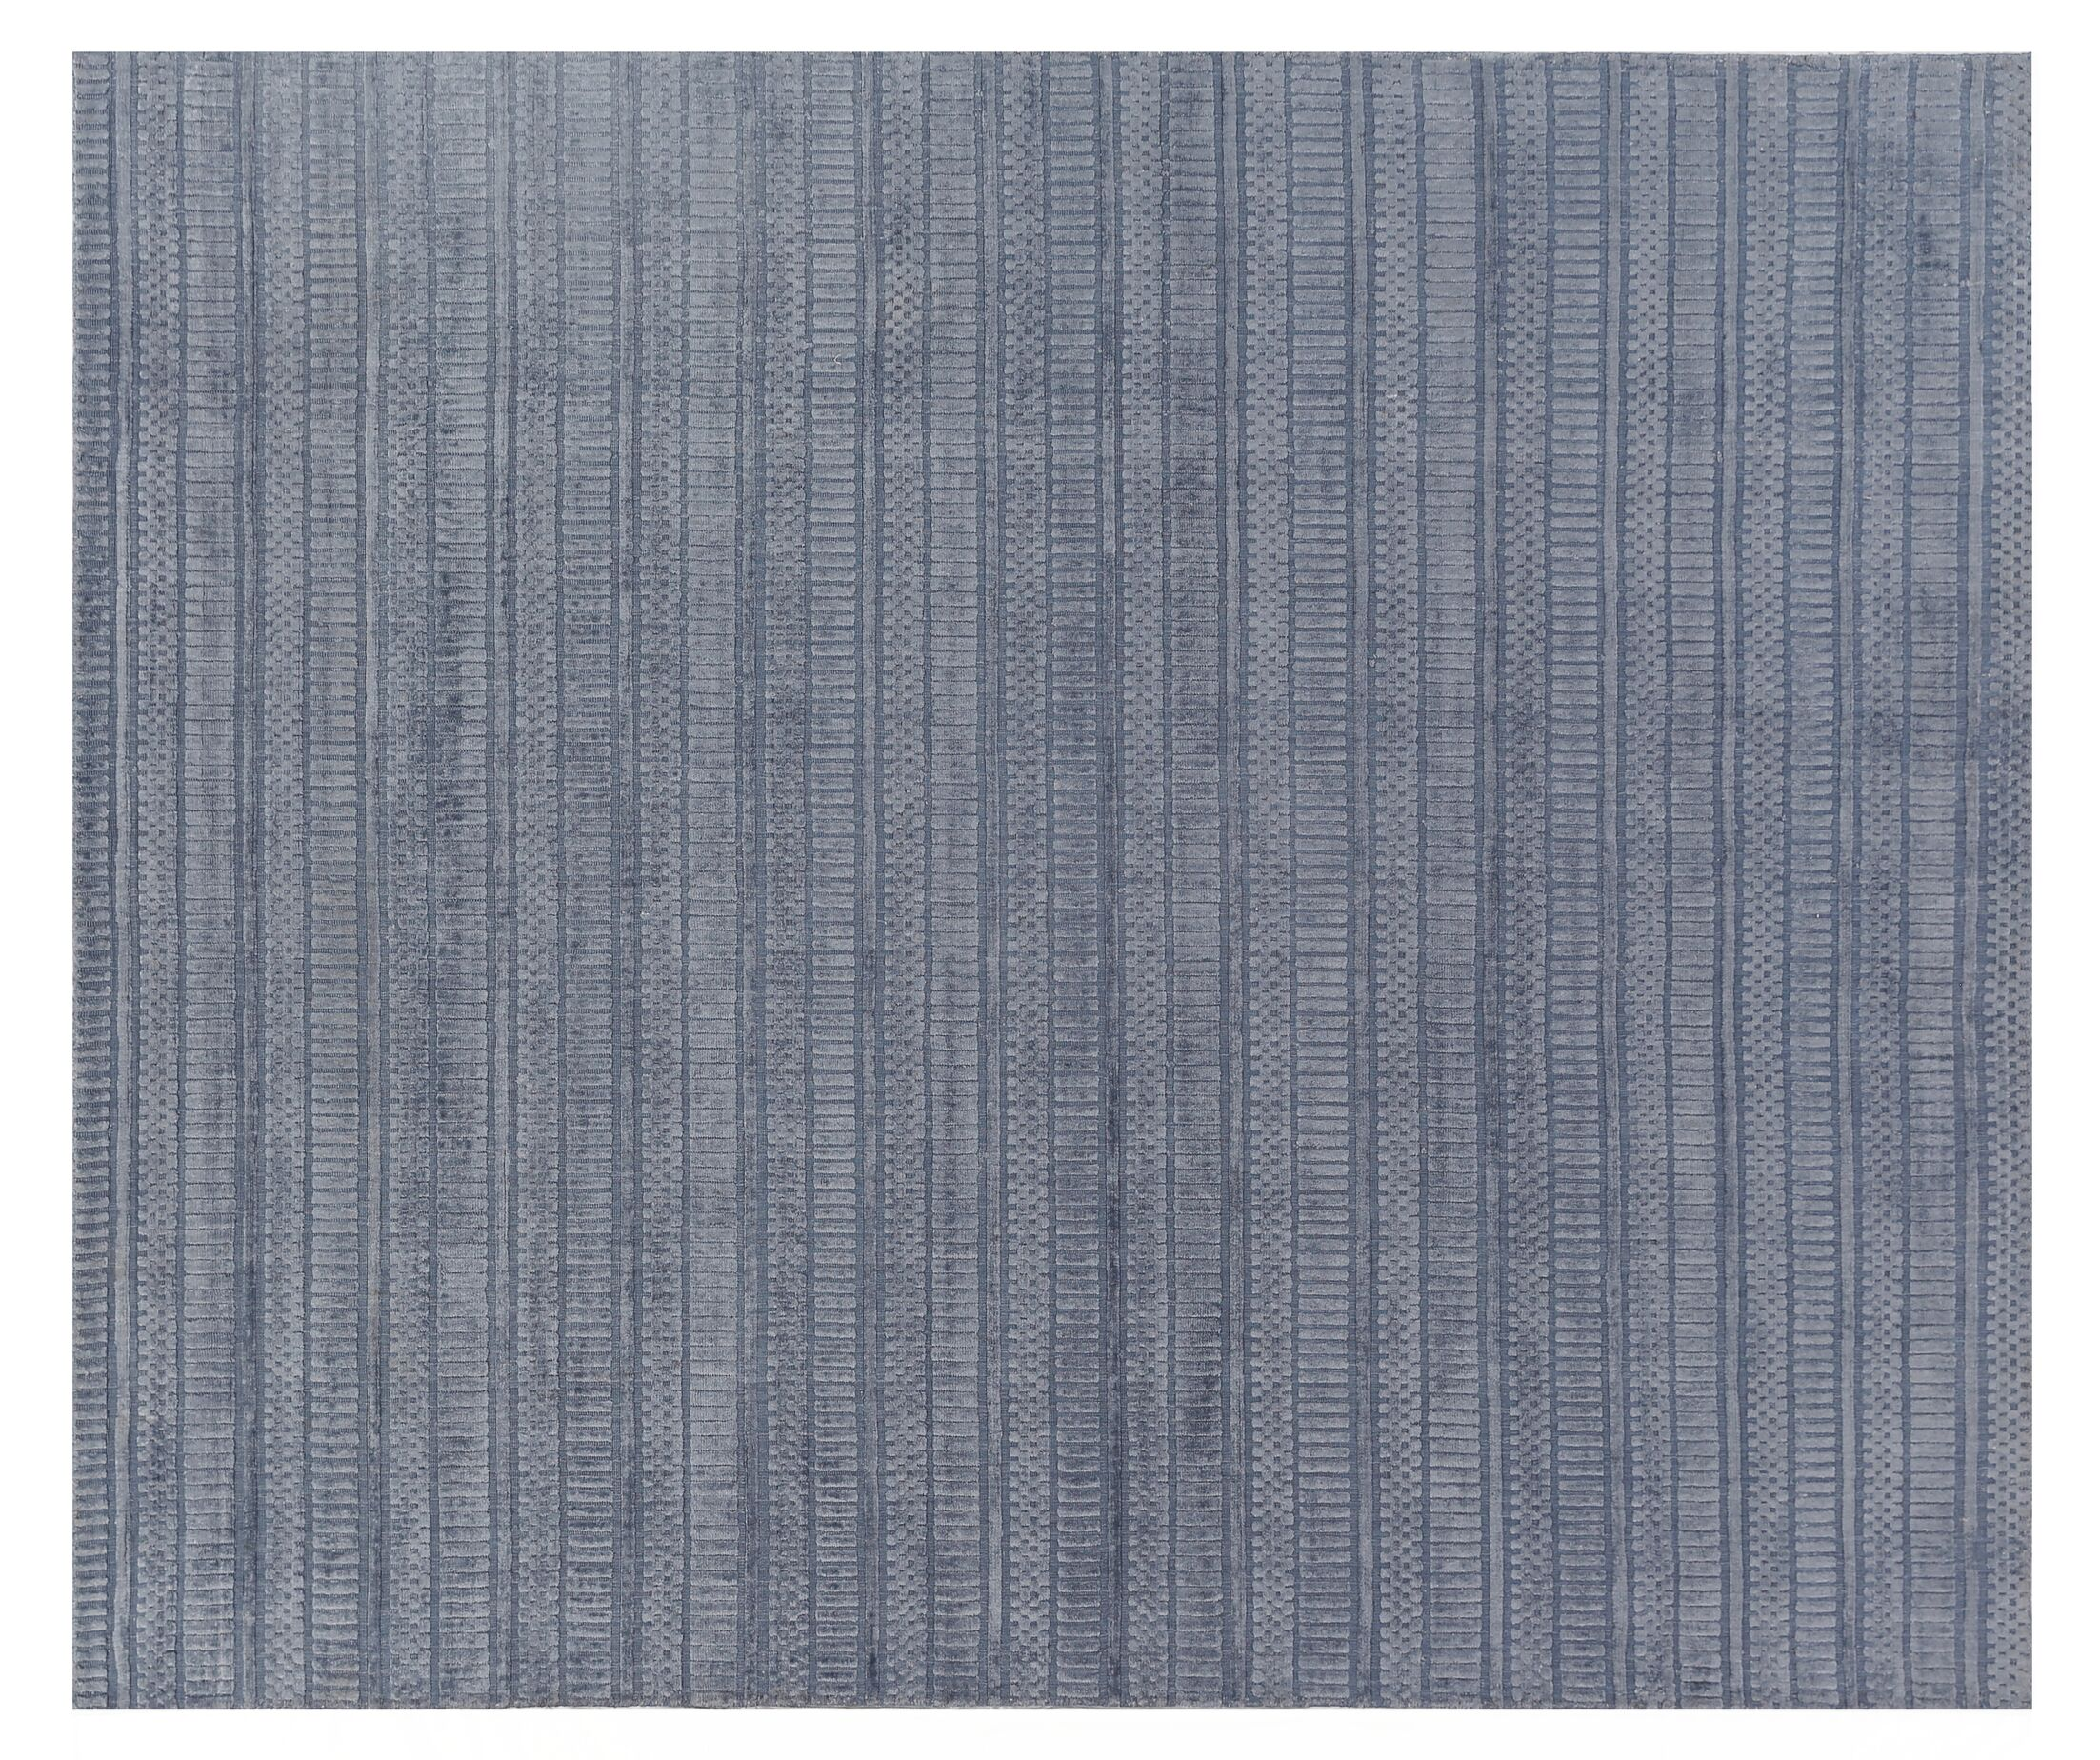 Addison Hand-Woven Gray Area Rug Rug Size: Rectangle 14' x 18'